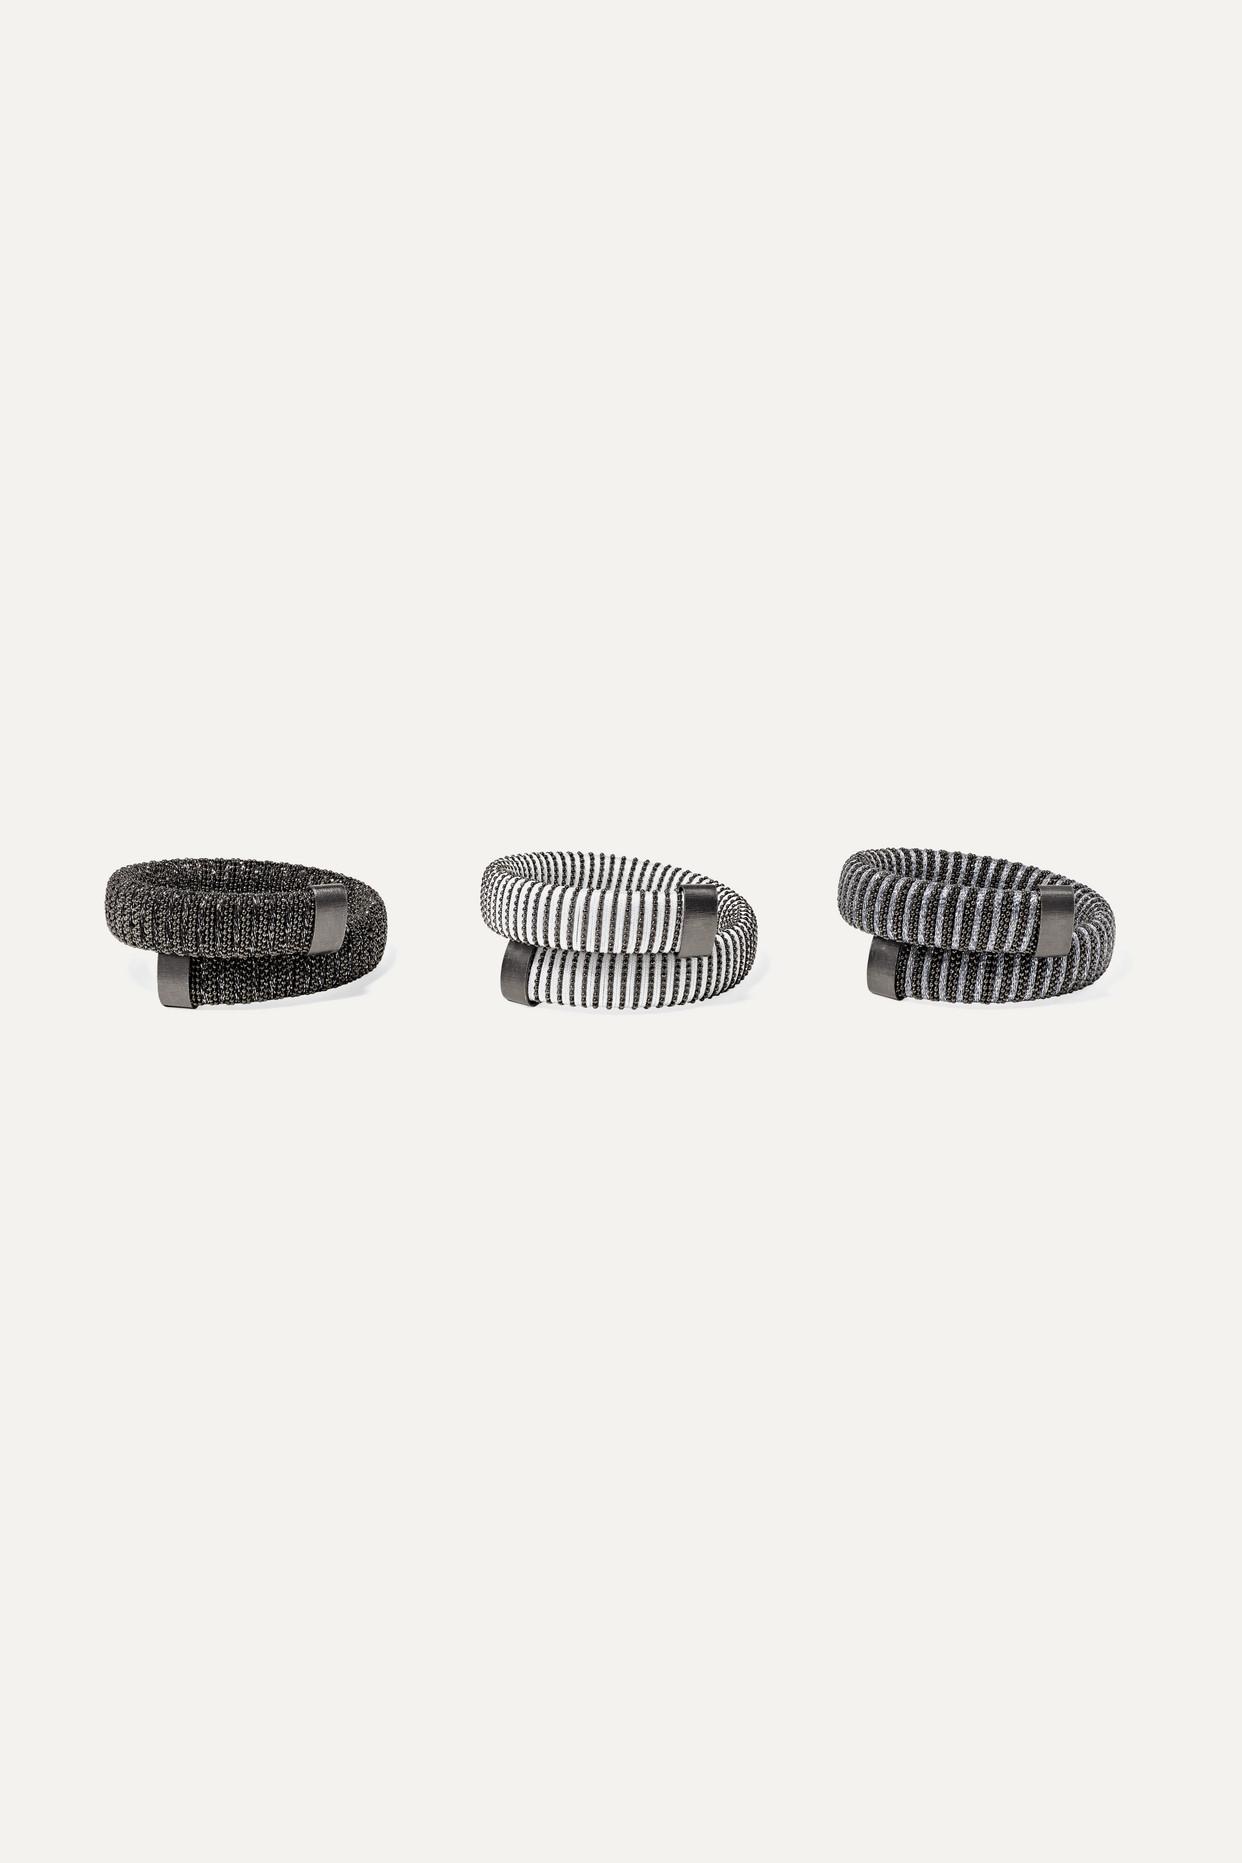 CAROLINA BUCCI - Caro Set Of Three Blackened Sterling Silver, Cotton And Lurex Bracelets - one size